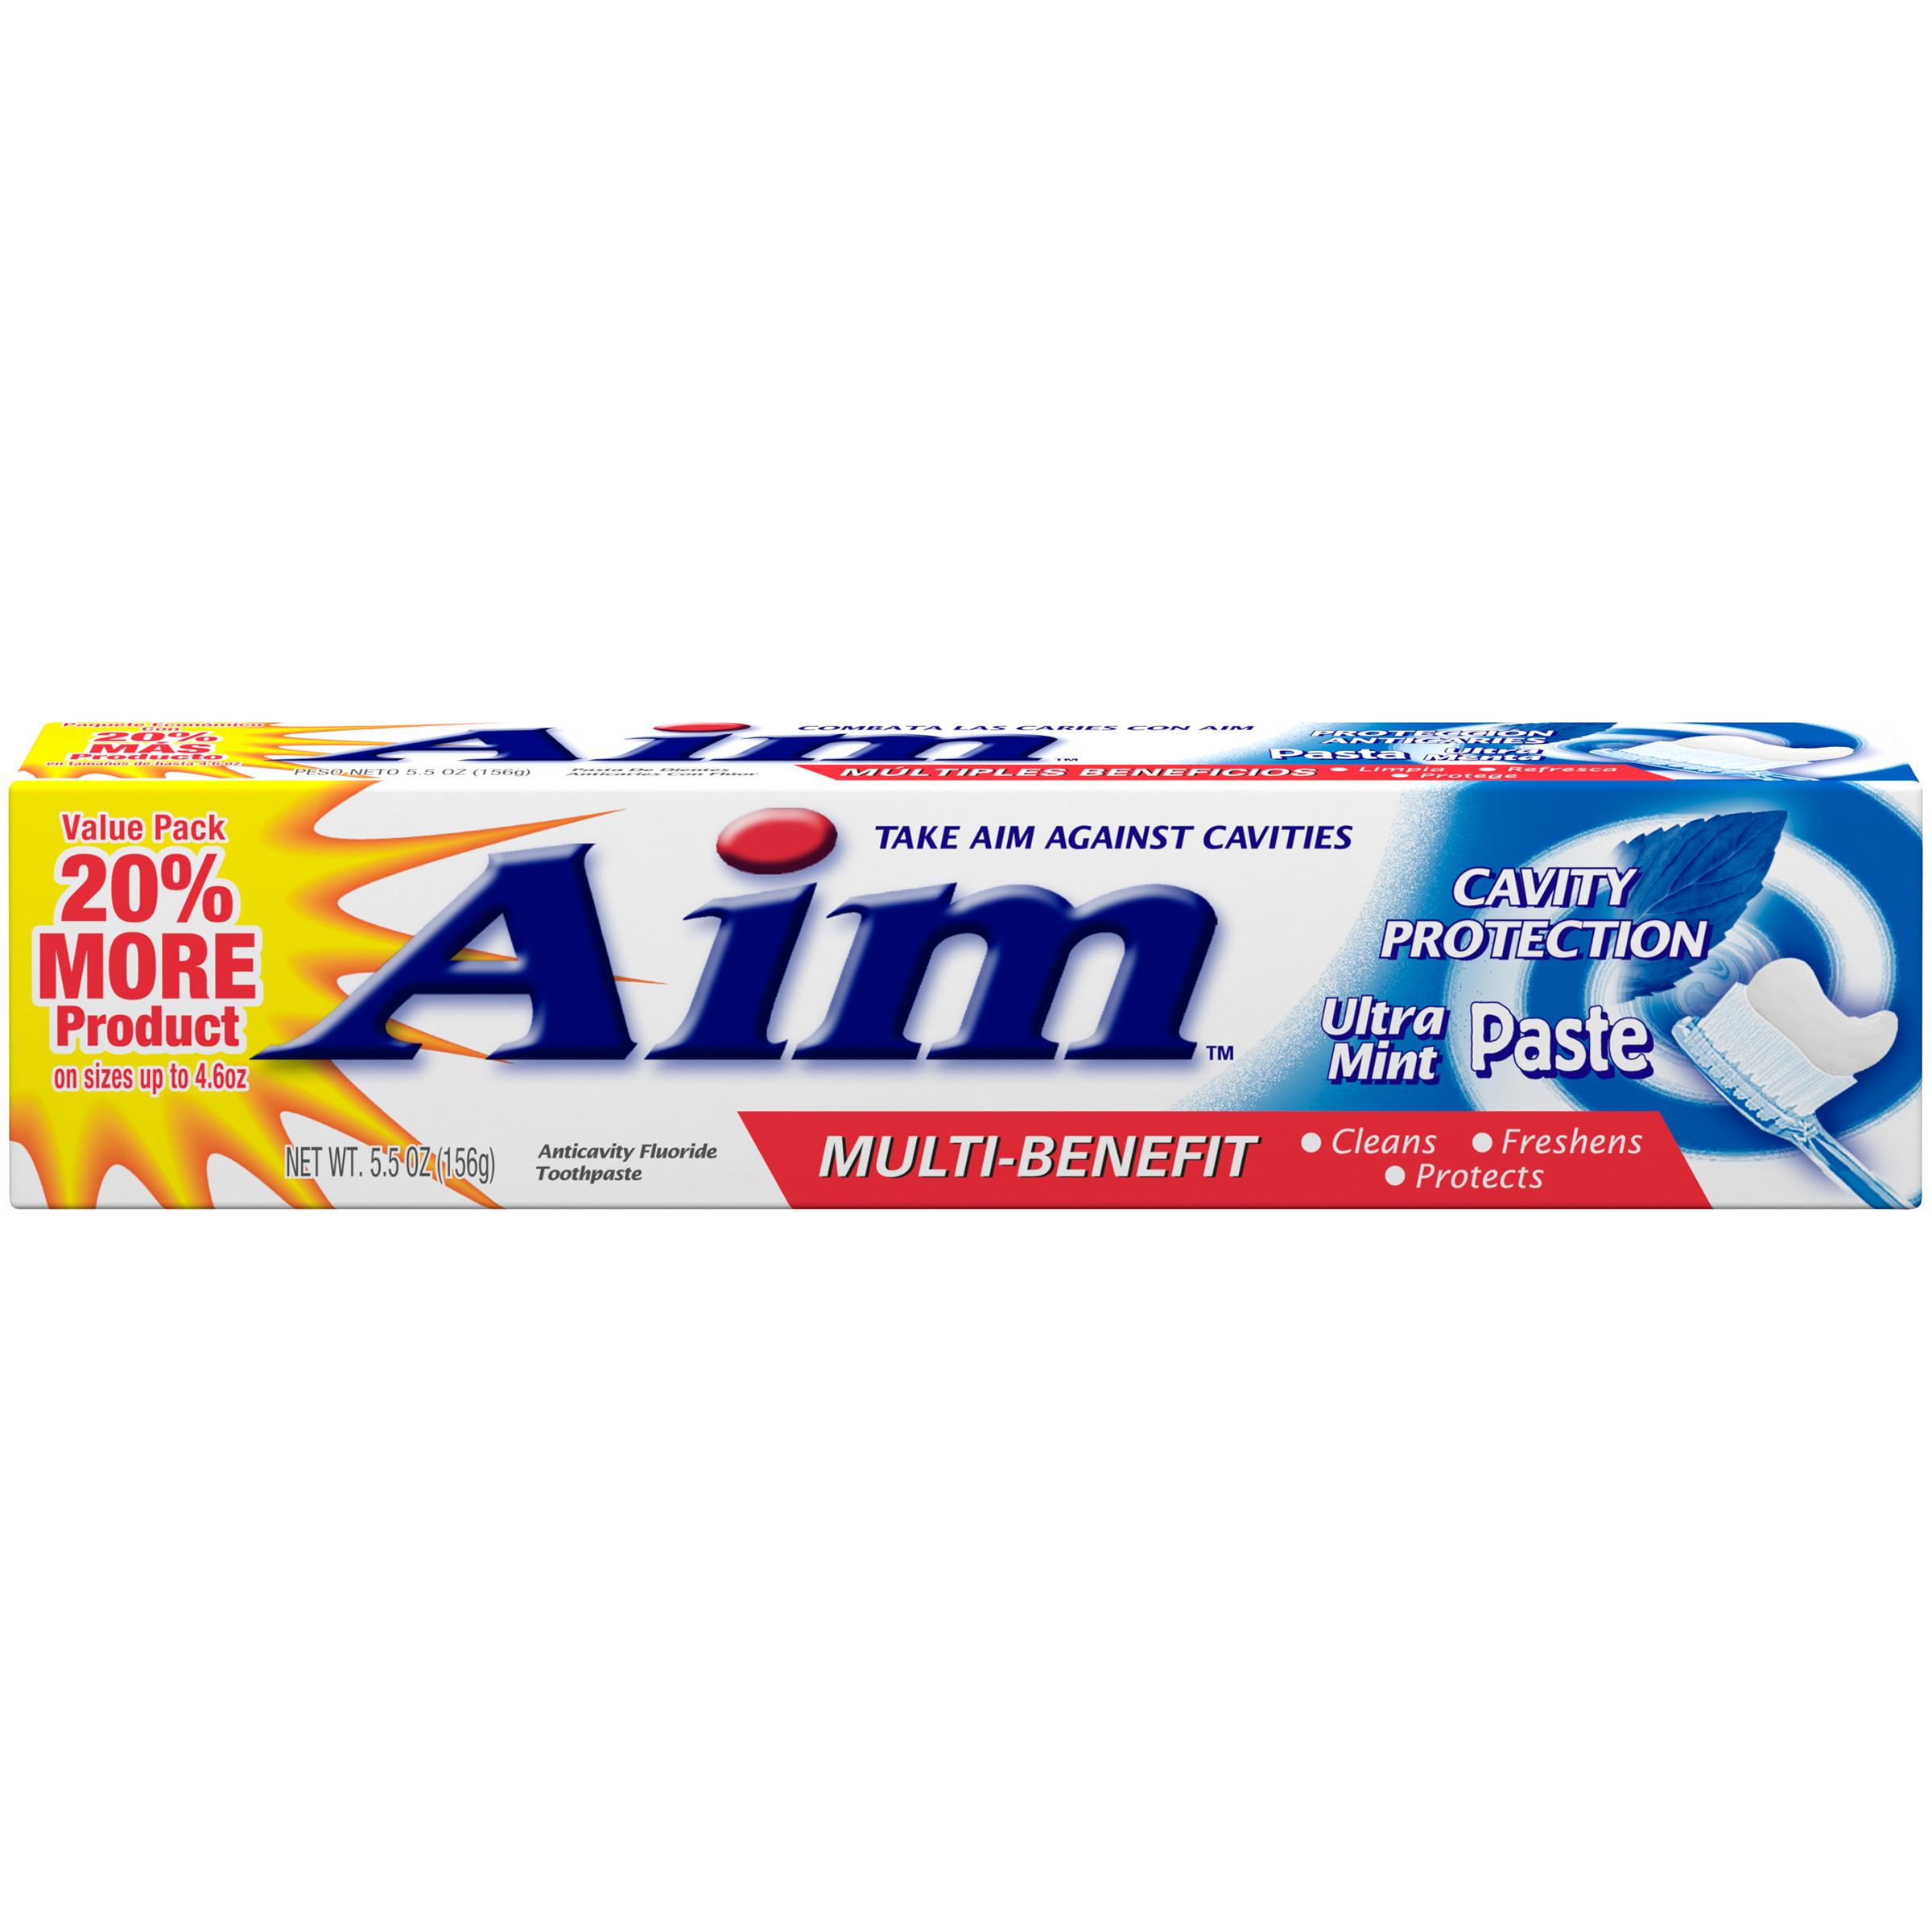 Aim Multi-Benefit Cavity Protection Gel, Ultra Mint